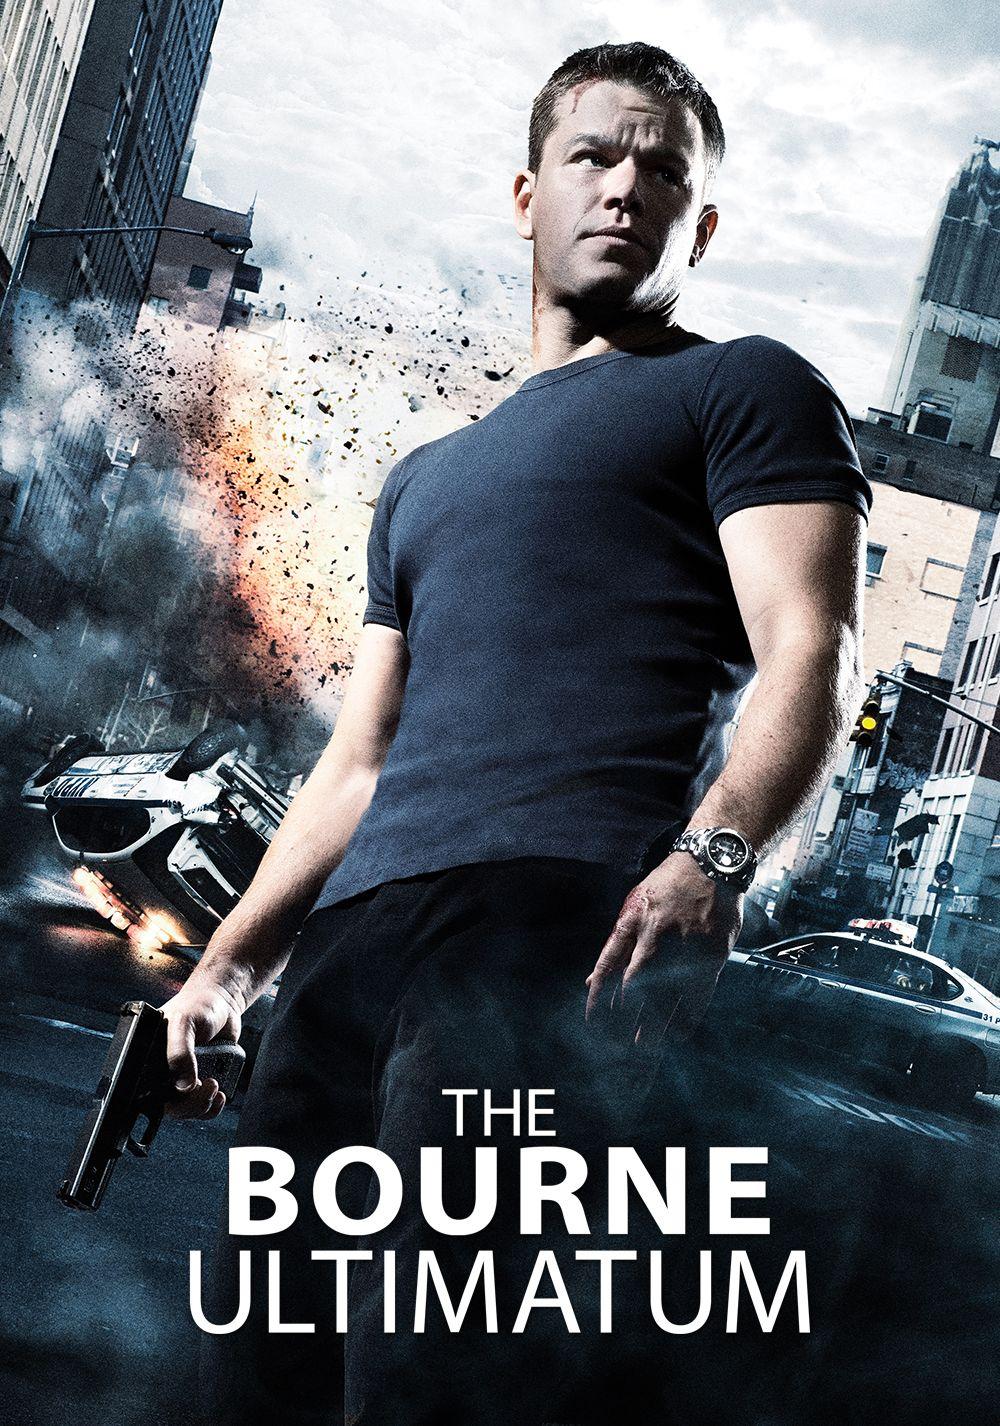 bourne ultimatum the ultimate bourne movie filmmusic